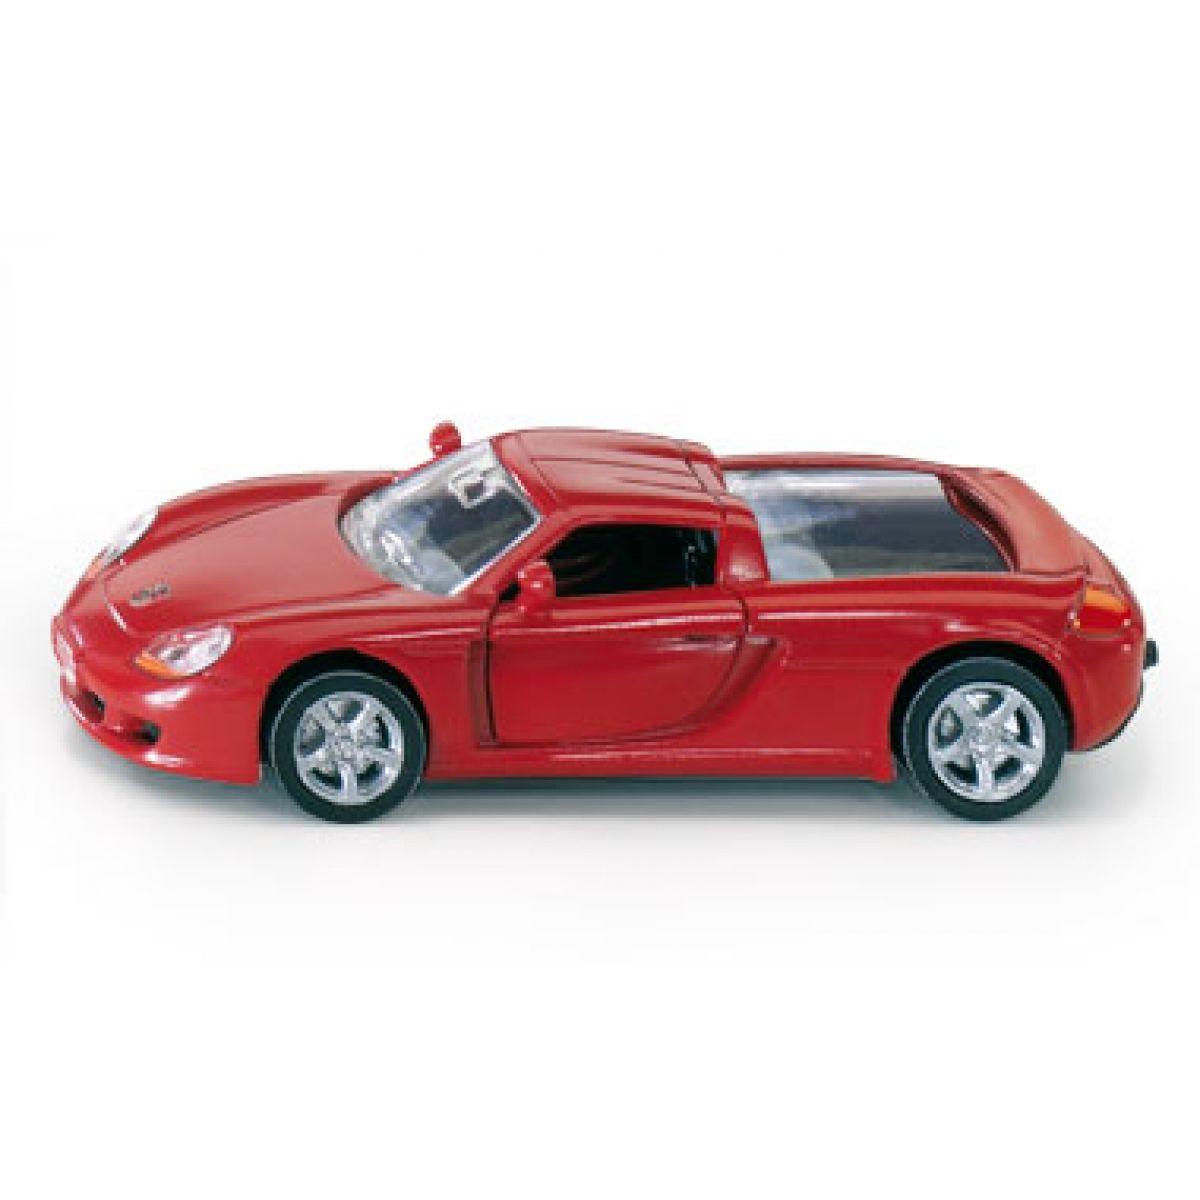 Siku 1001 Porsche Carrera GT